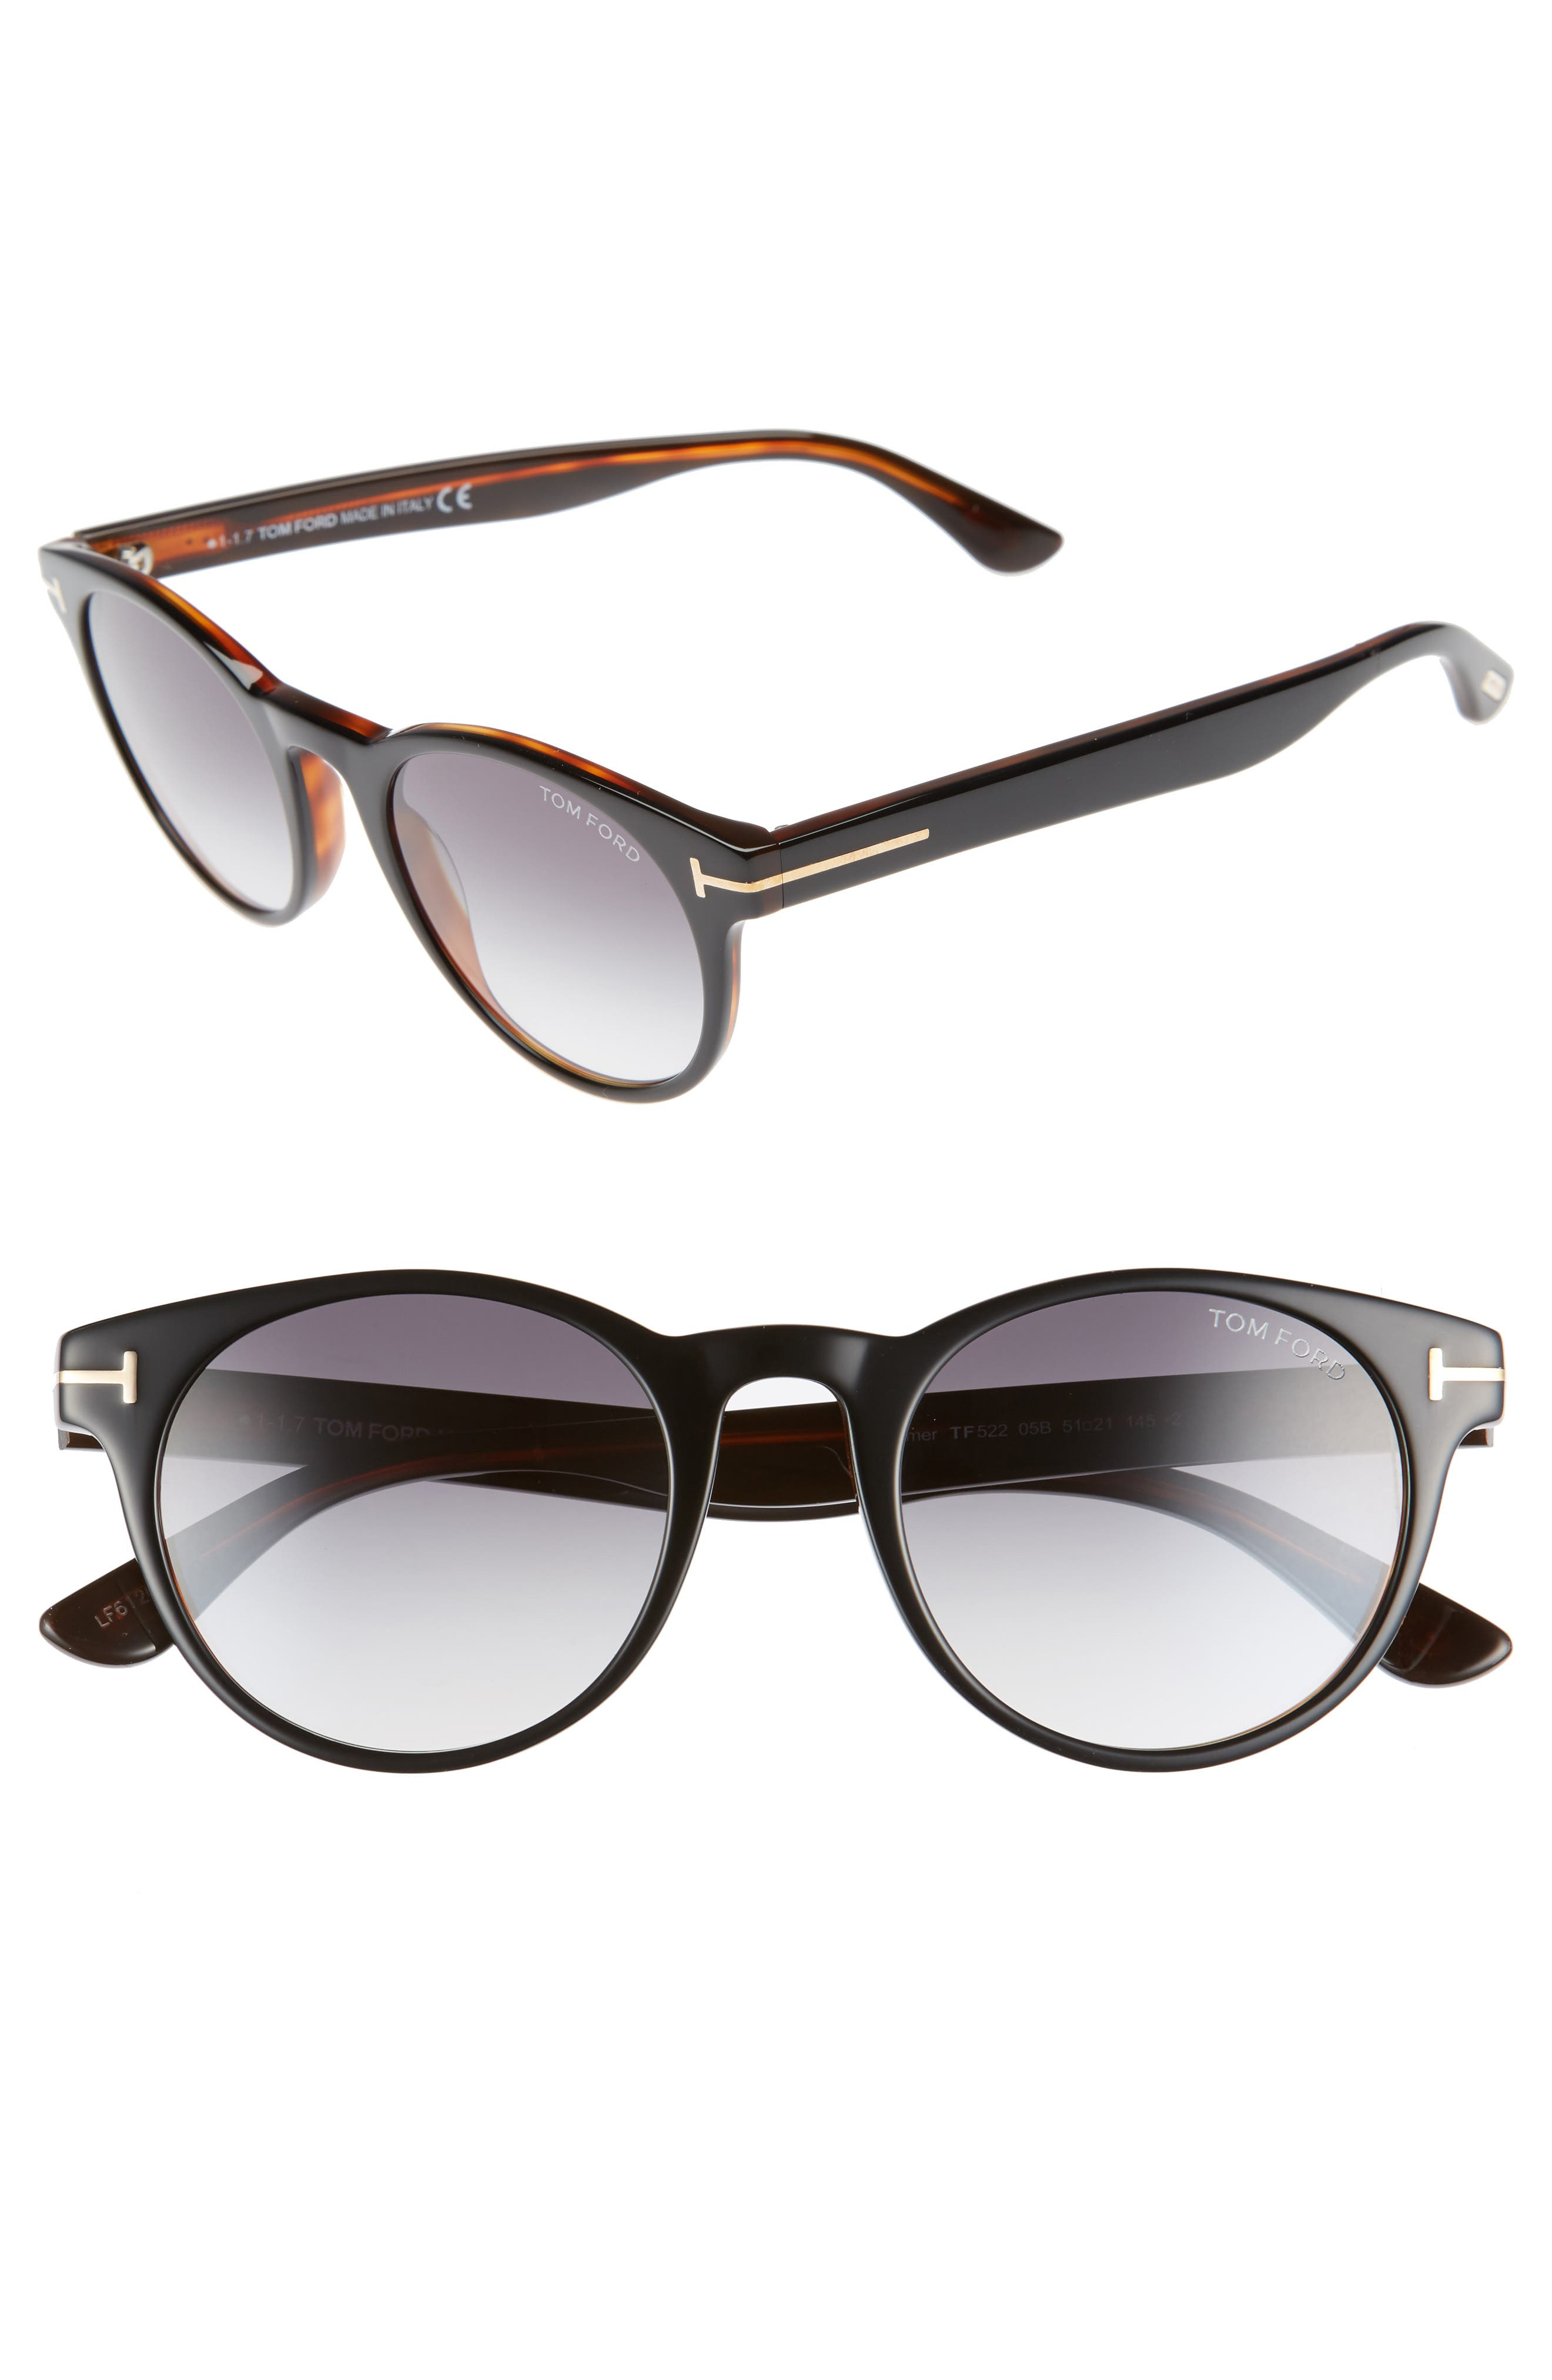 Palmer 51mm Gradient Lens Sunglasses,                         Main,                         color, Black/ Gradient Smoke